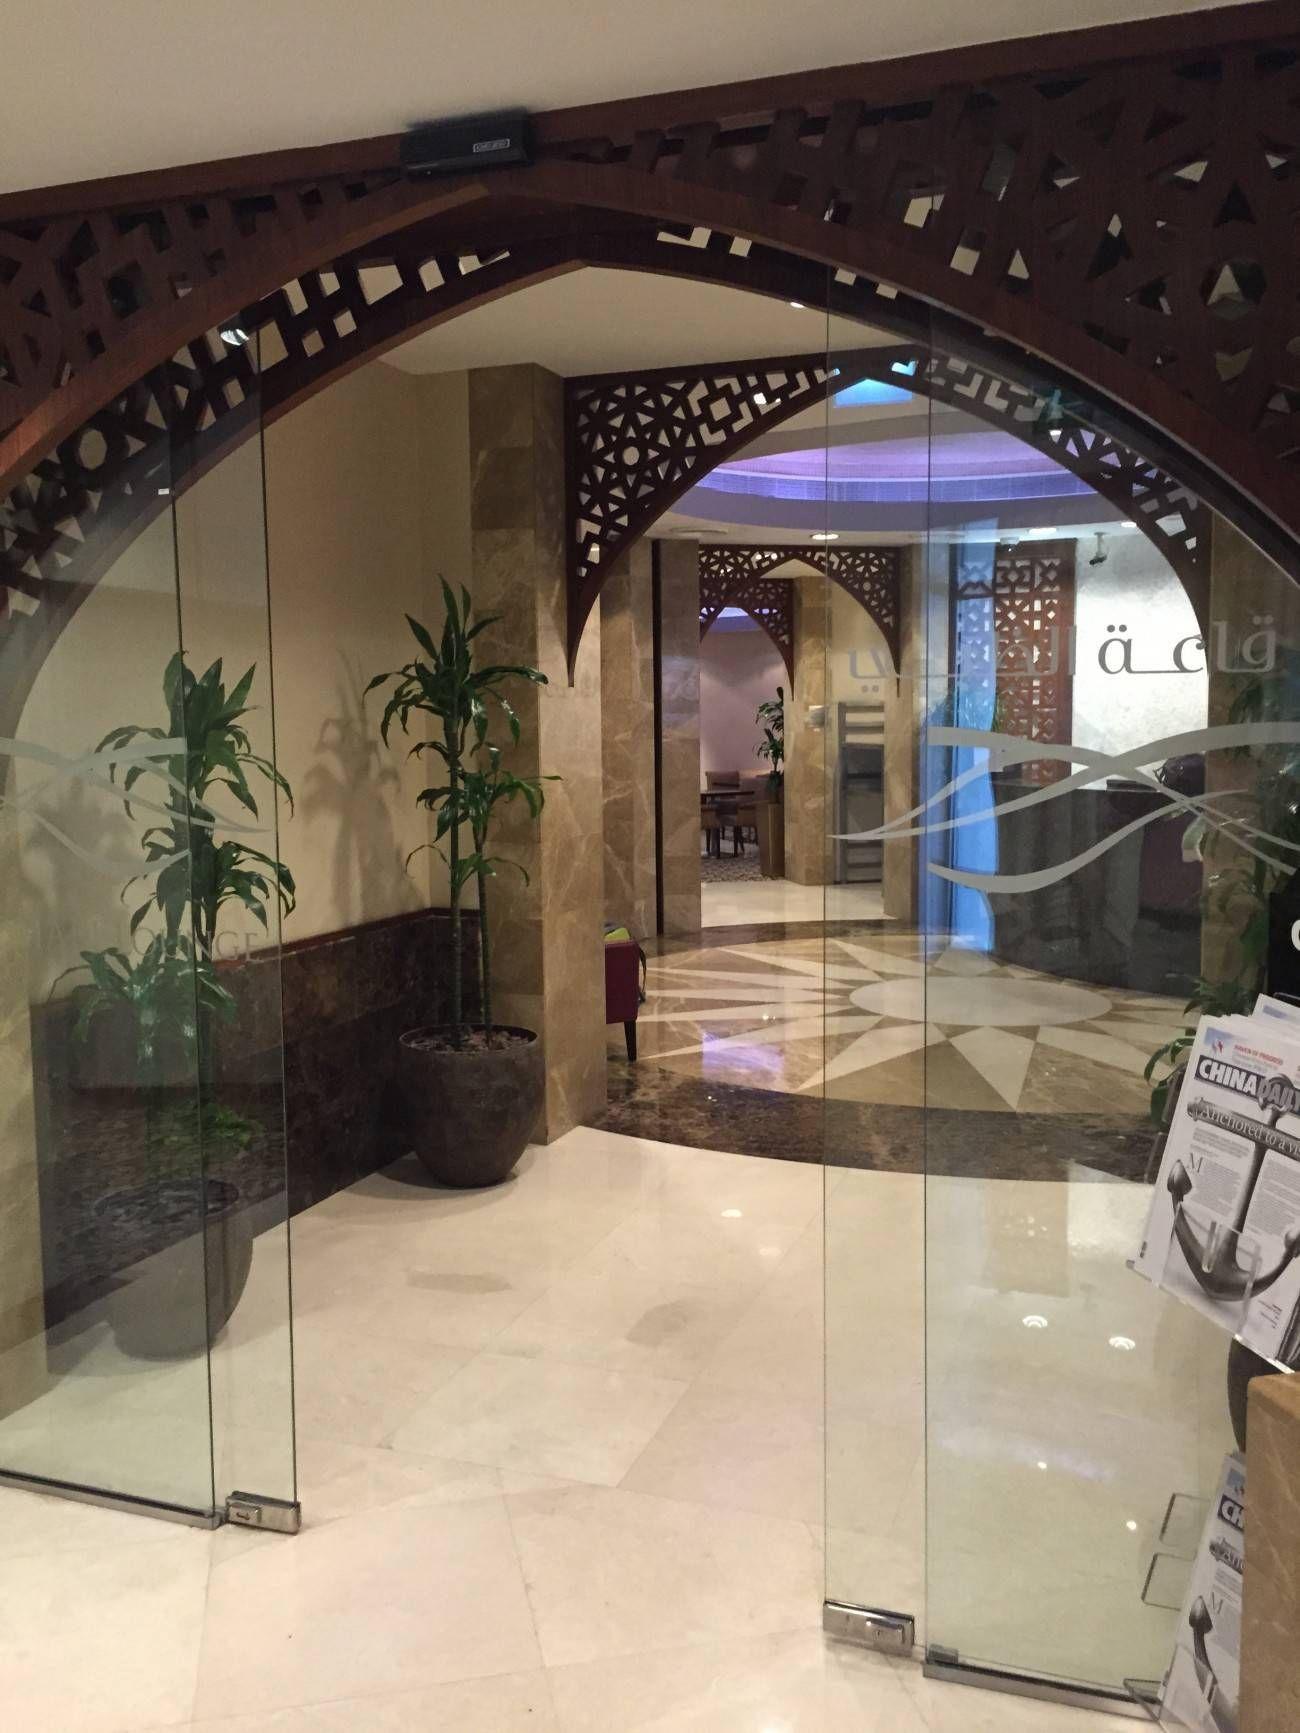 al dhabi lounge abu dhabi